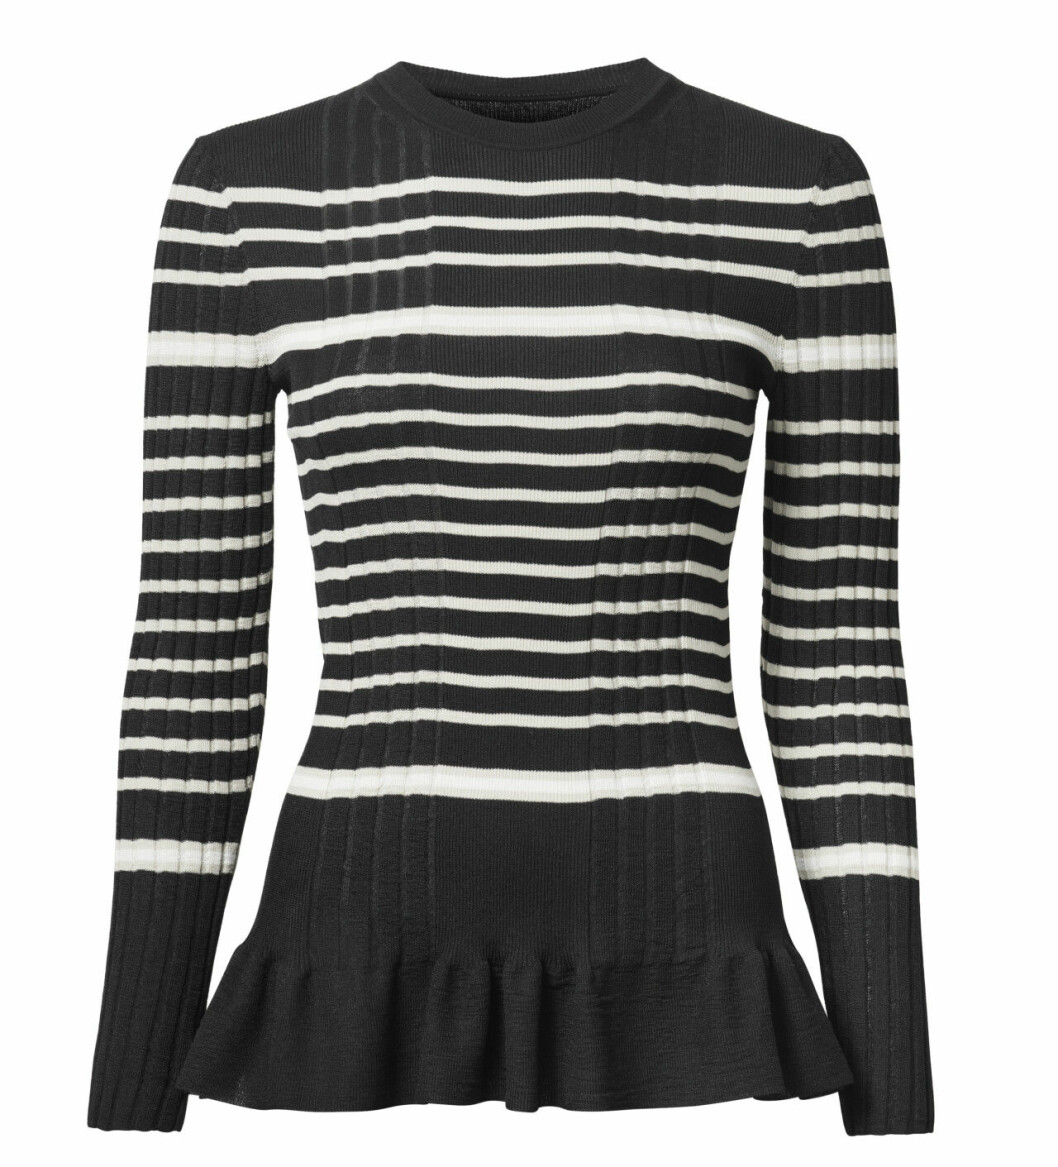 H&M conscious exclusive SS20 – stickad tröja